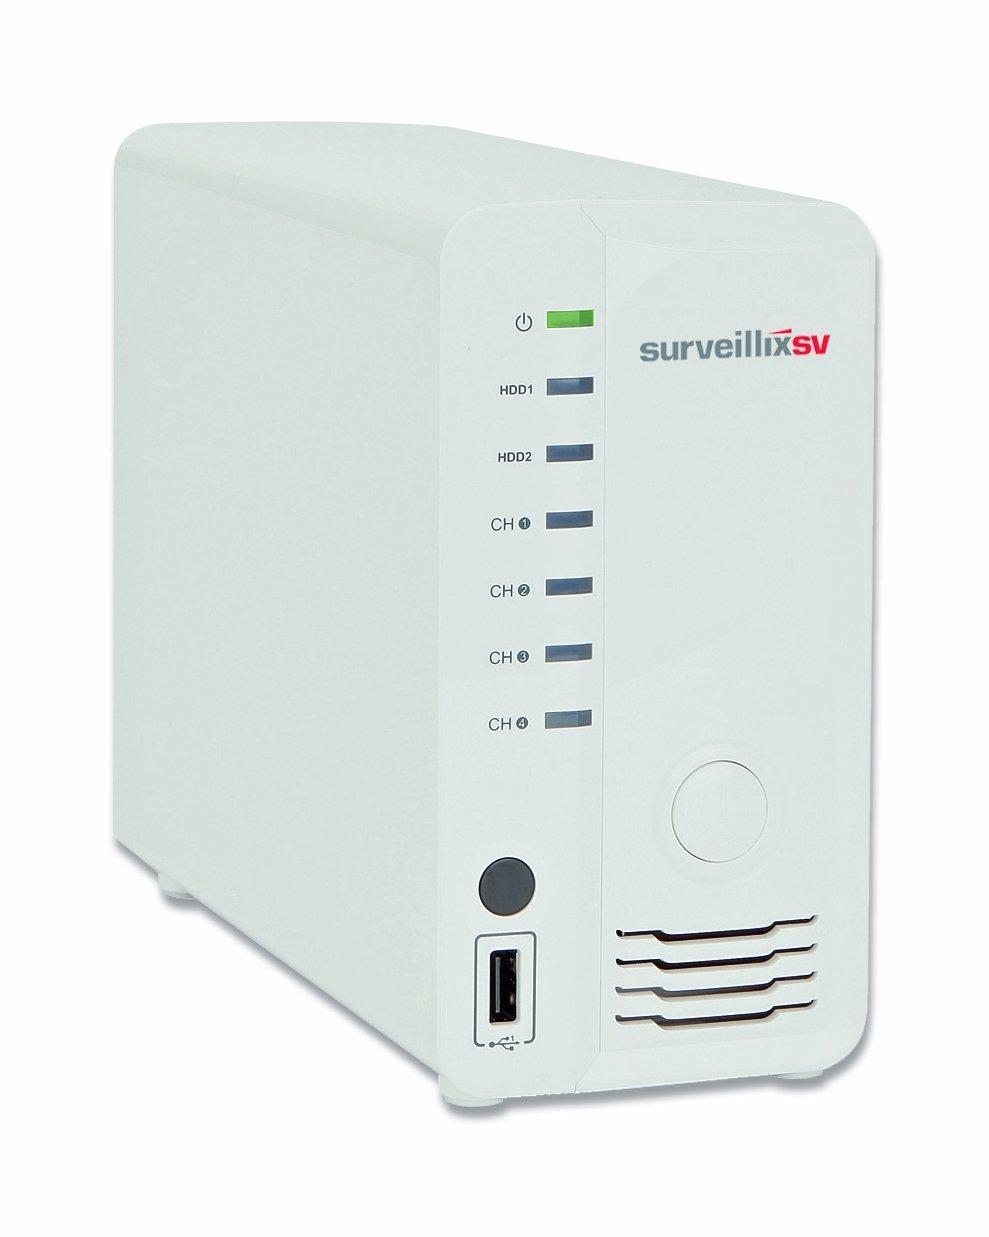 Toshiba ESV4-1T Surveillix SV 4-Channel Network Video Recorder (White) [並行輸入品] B019SZDIJ2